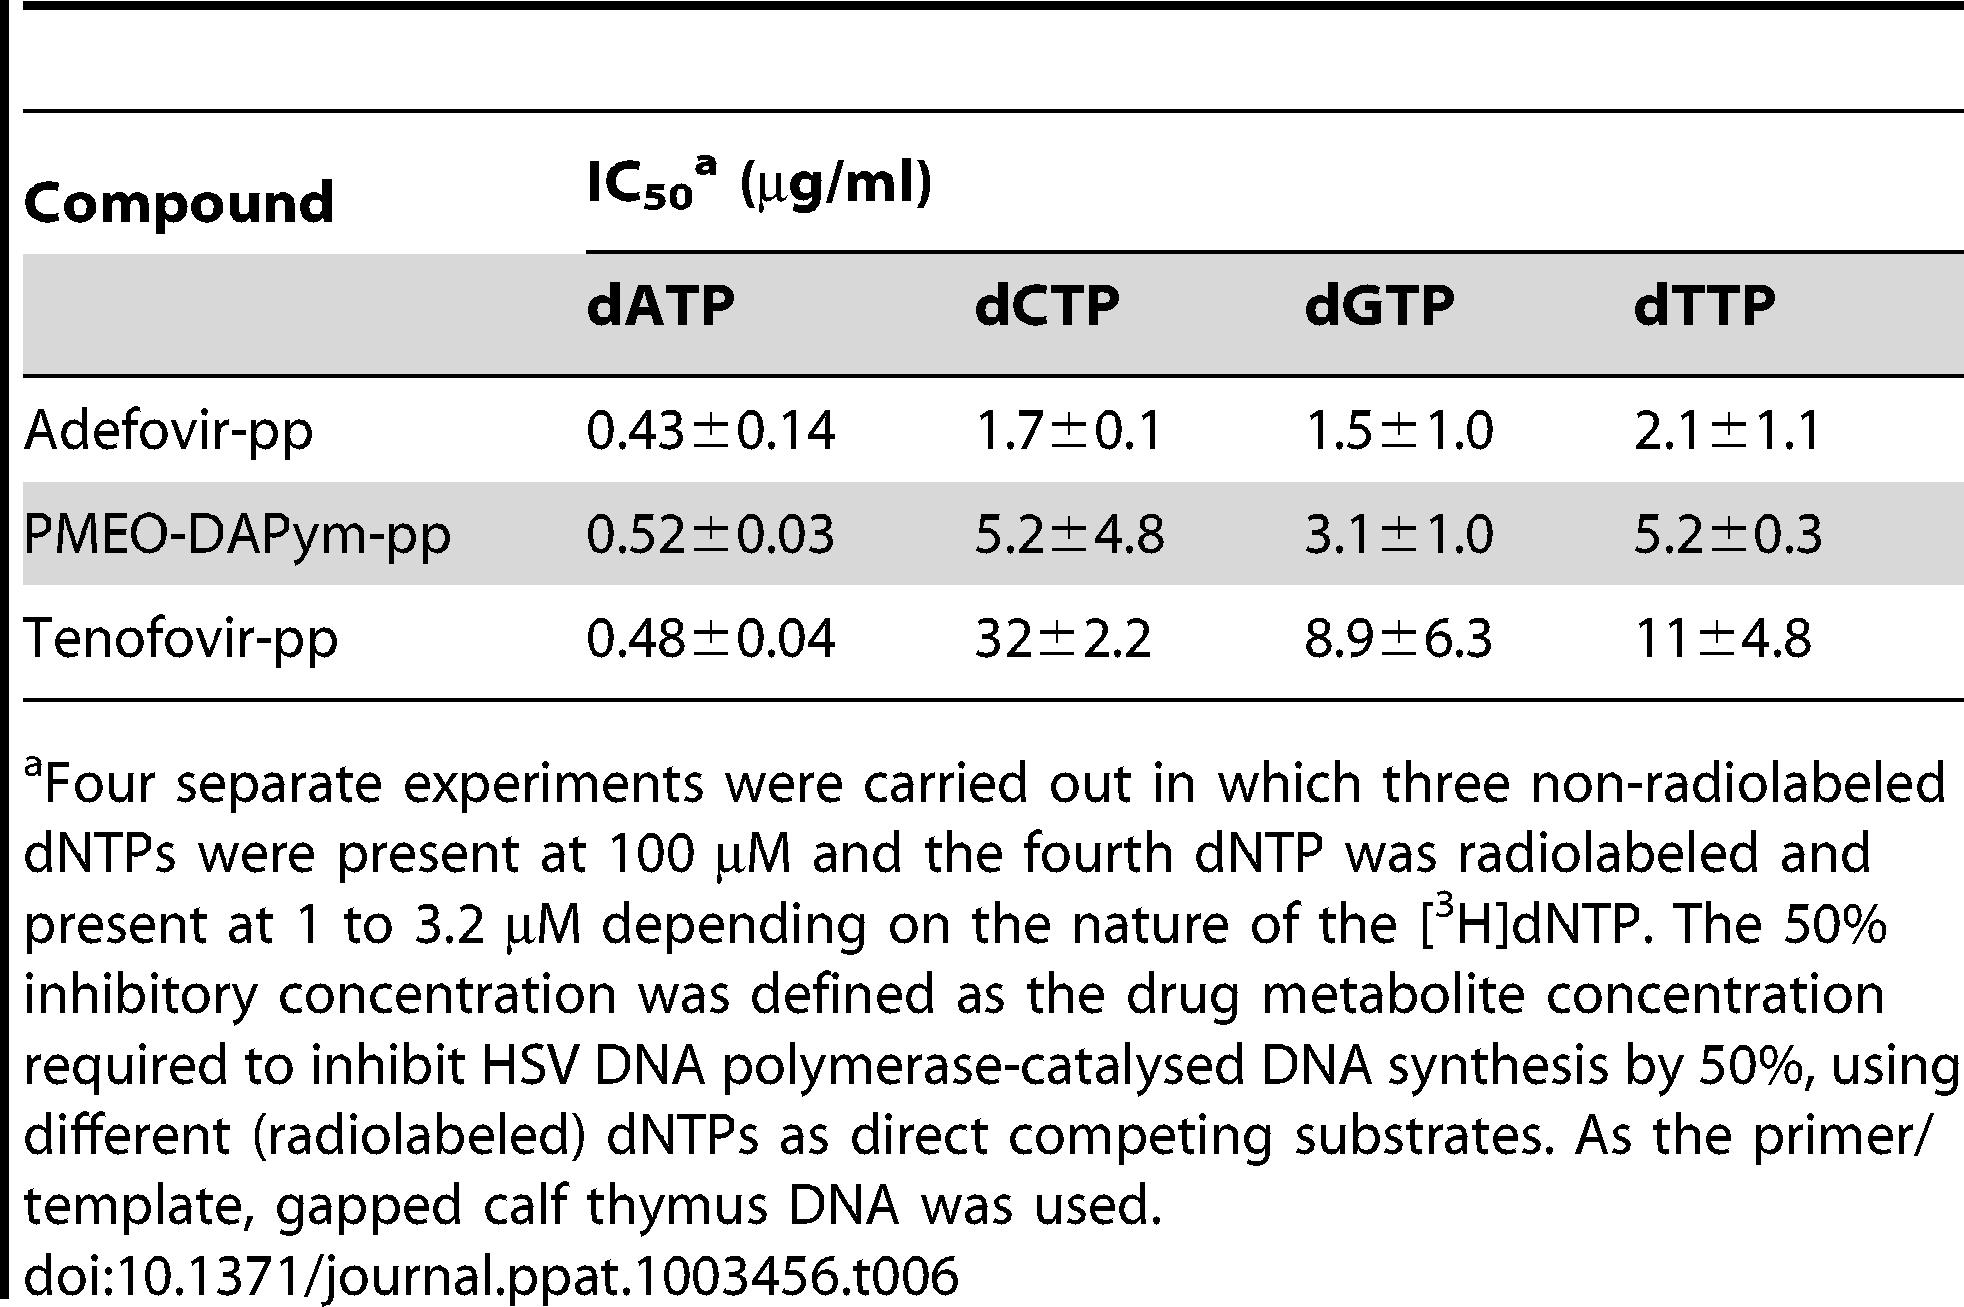 Inhibitory activity of the diphosphate metabolites of adefovir, tenofovir, and PMEO-DAPym against HSV DNA.